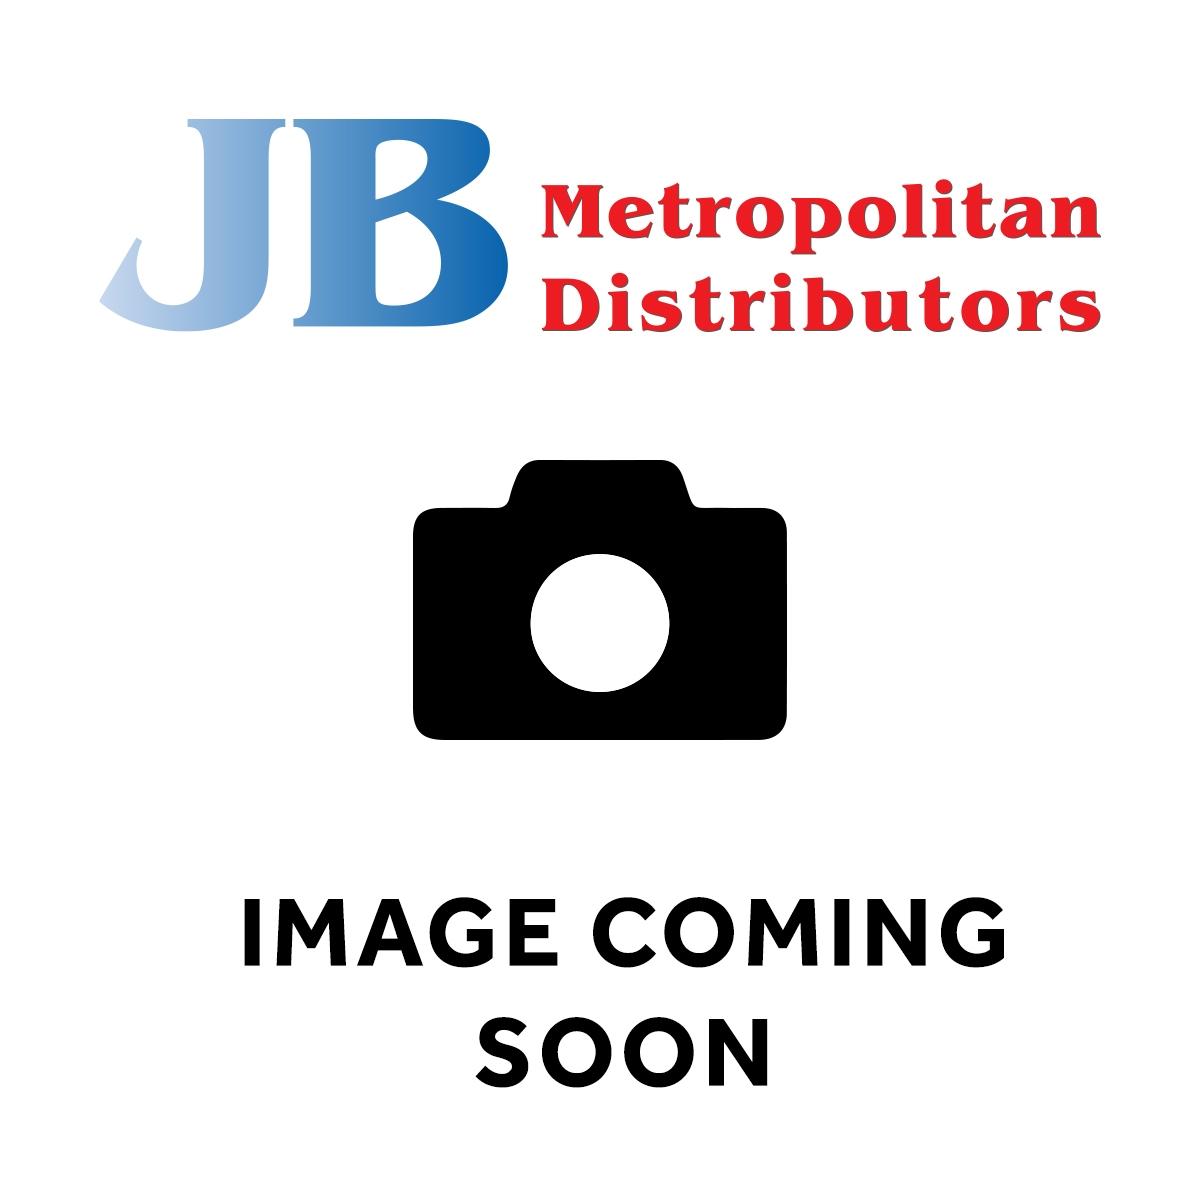 180G CADBURY MEDIUM BAG DAIRY MILK